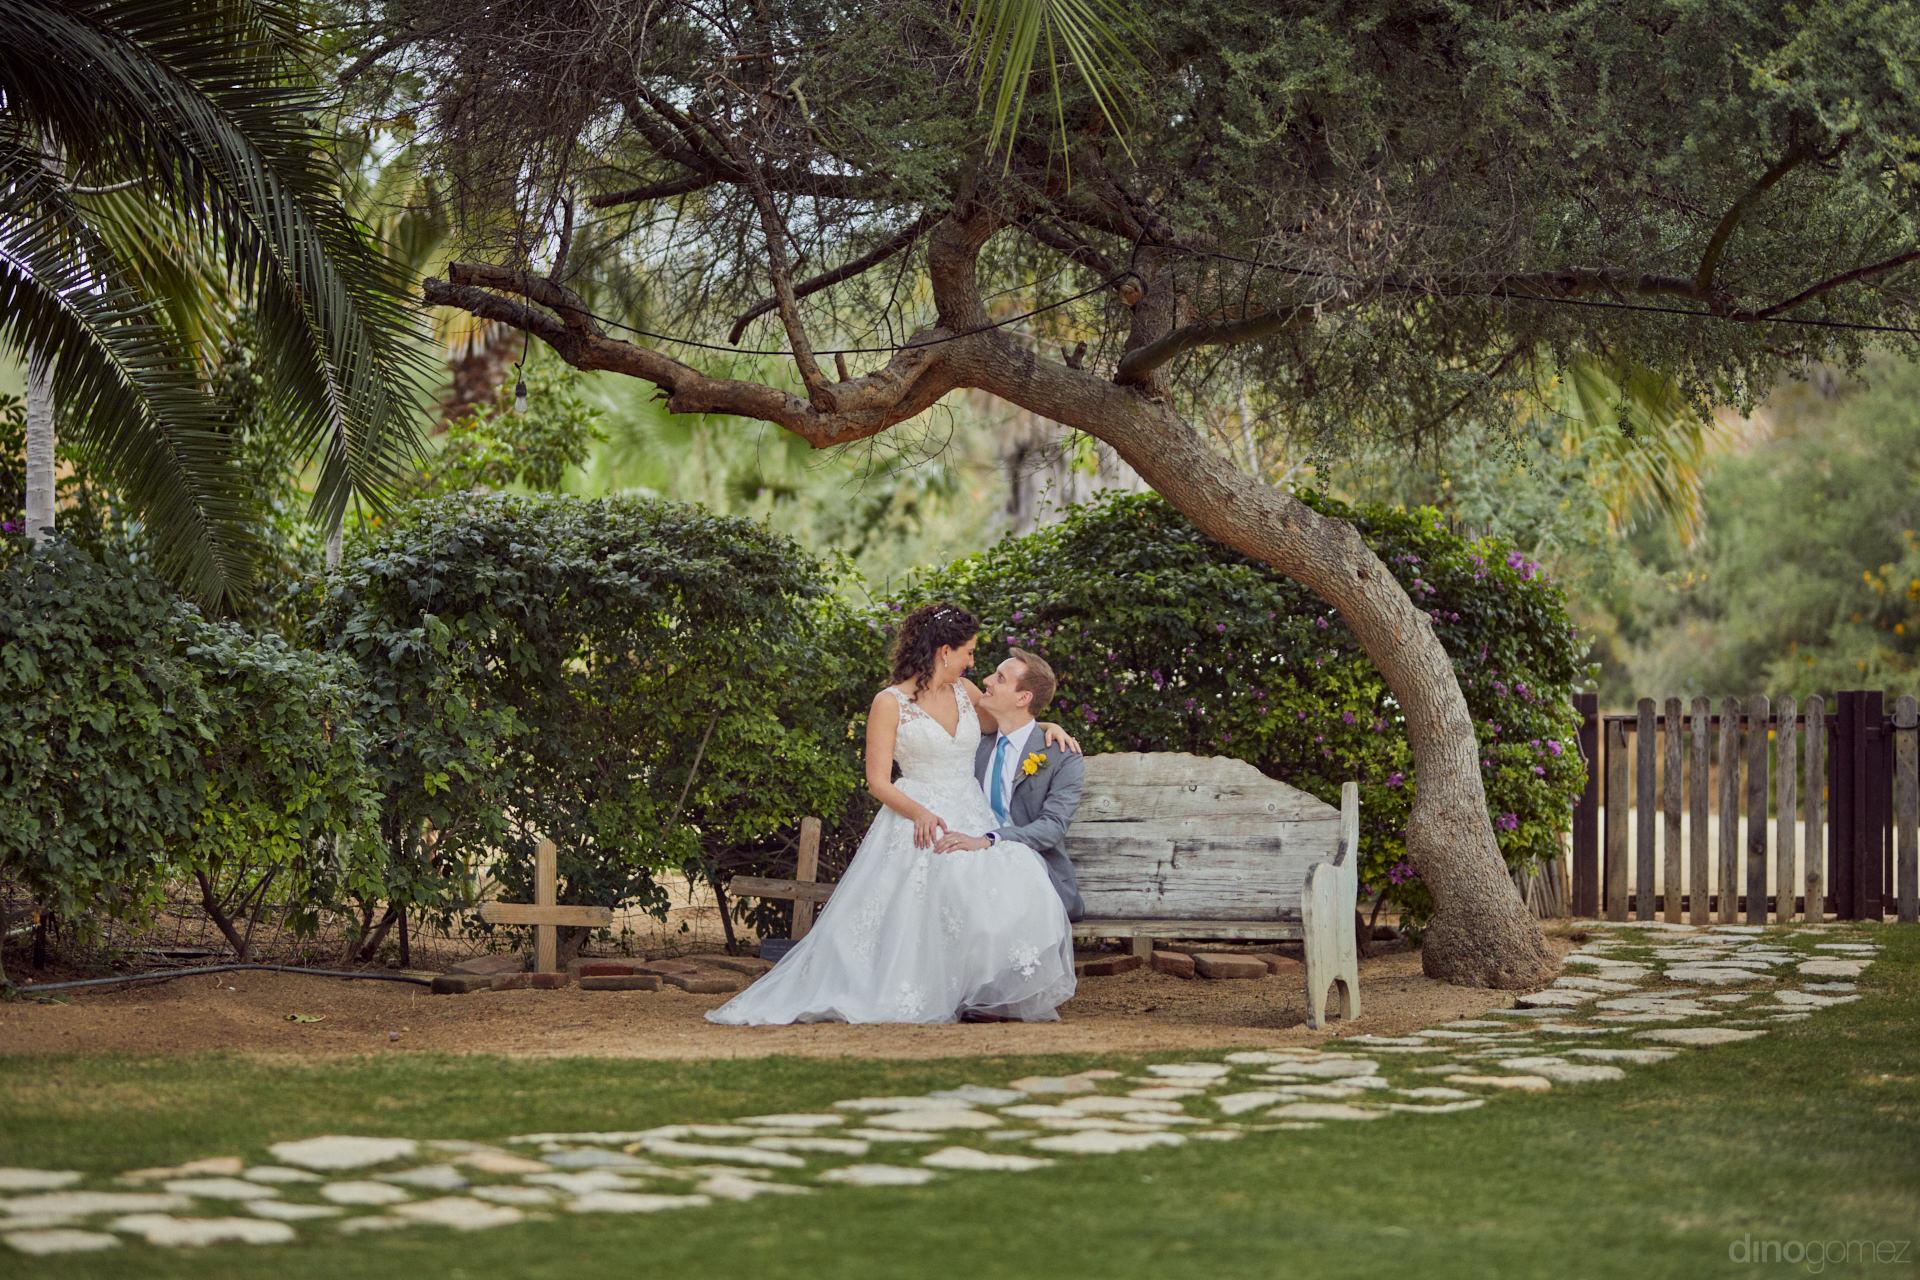 Top Destination Wedding Photographers - Hilary & Bryan Flora Wedding